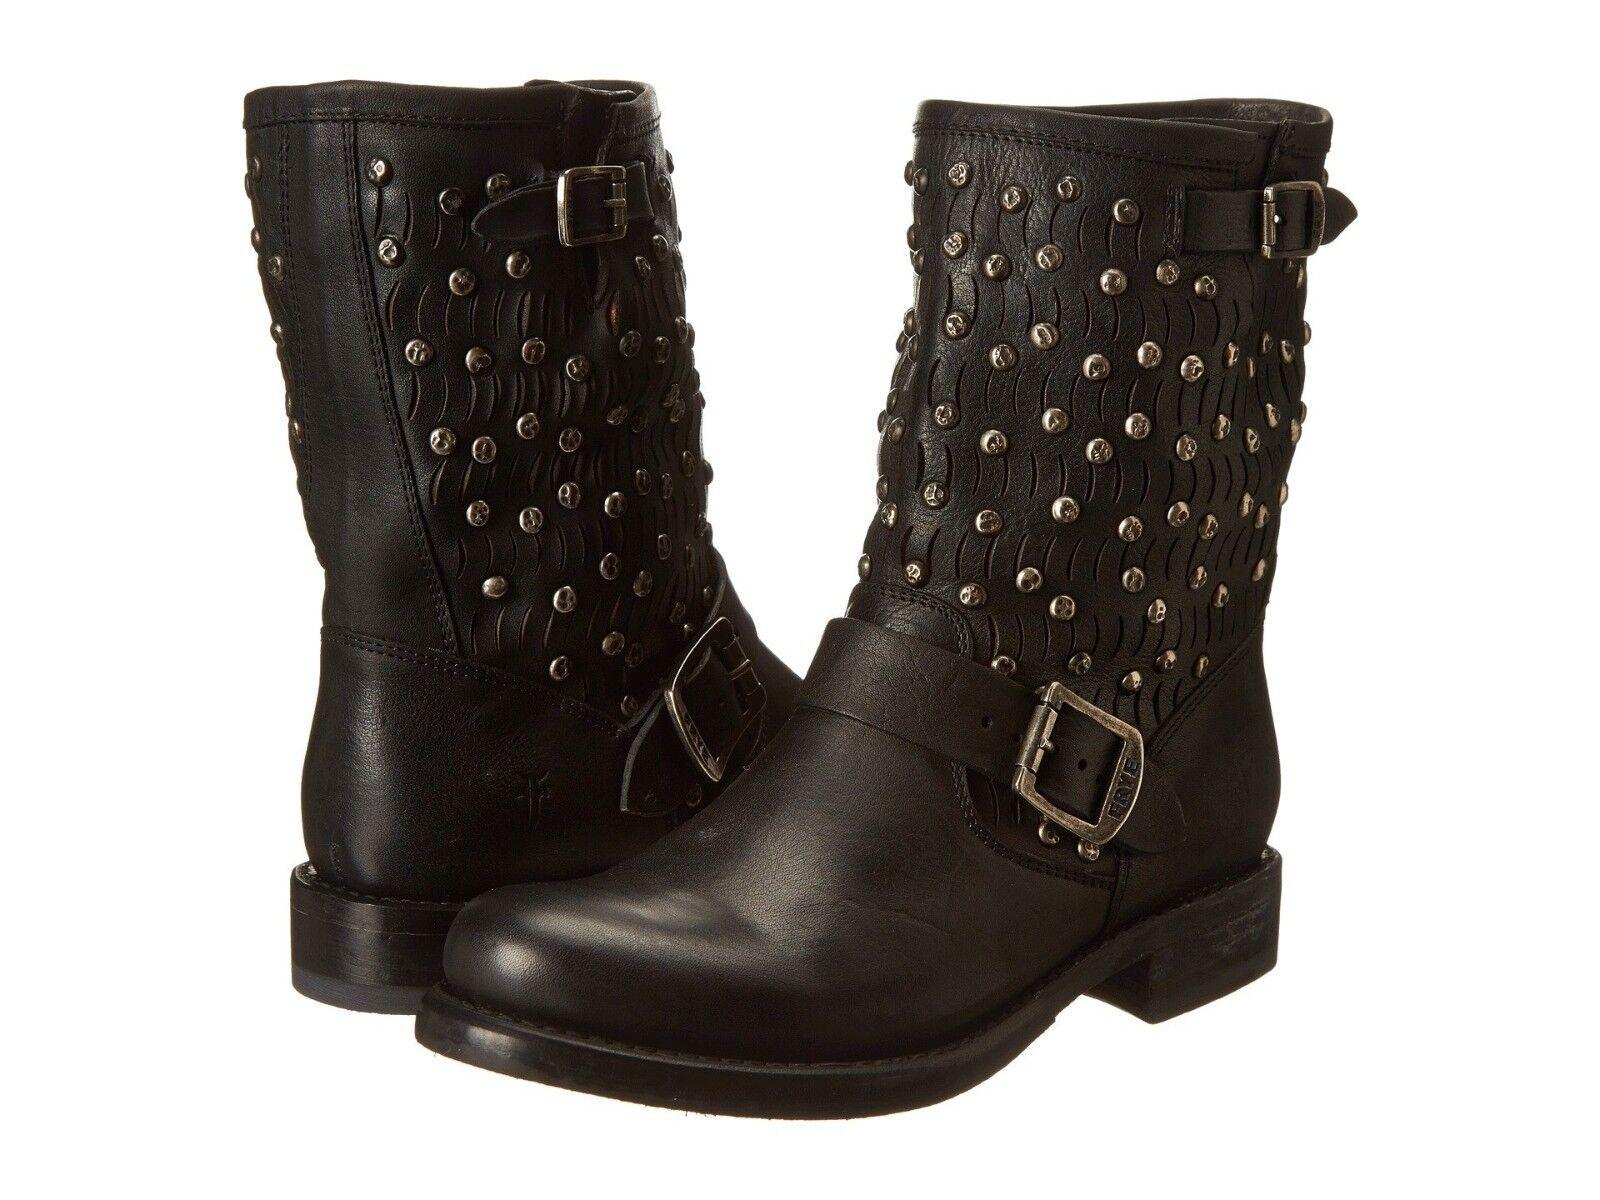 FRYE Jenna Cut Stud Short Moto Black Distressed Boot Size 5.5 NEW IN BOX $428.00